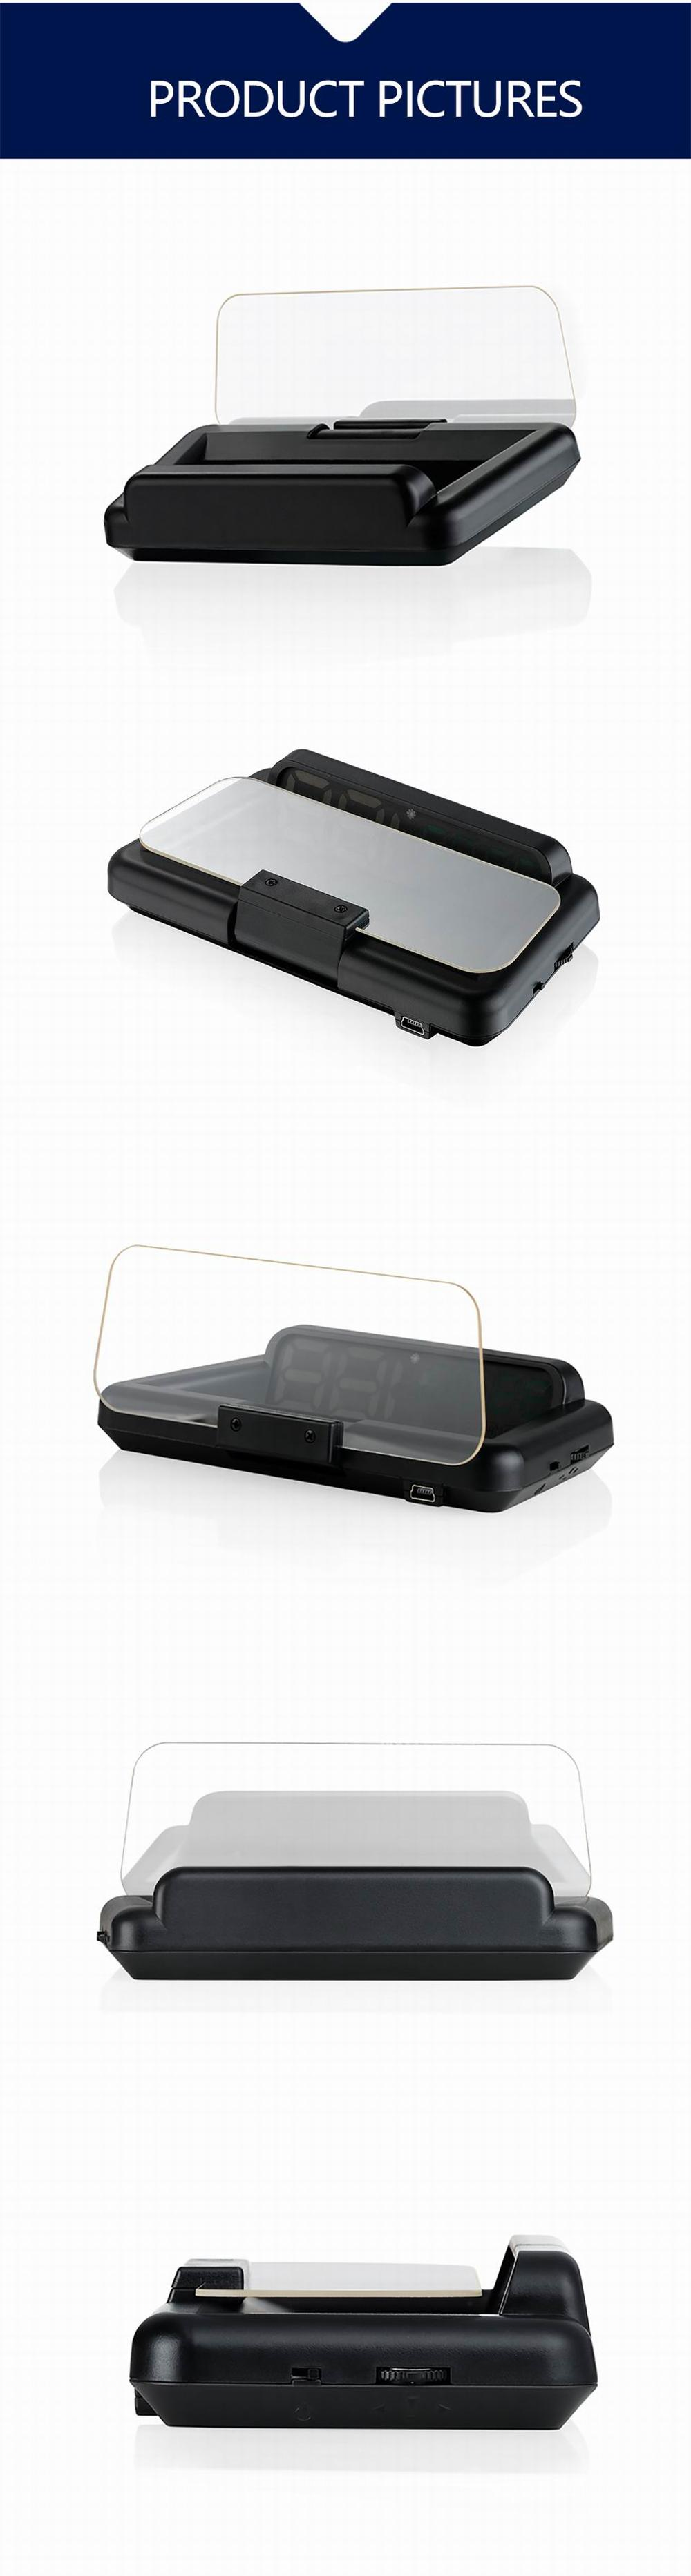 Original VJOYCAR C500 OBD2 Hud T900 GPS Head Up Display Projector Digital Car Speed Projector On-Board Computer Fuel Mileage 27